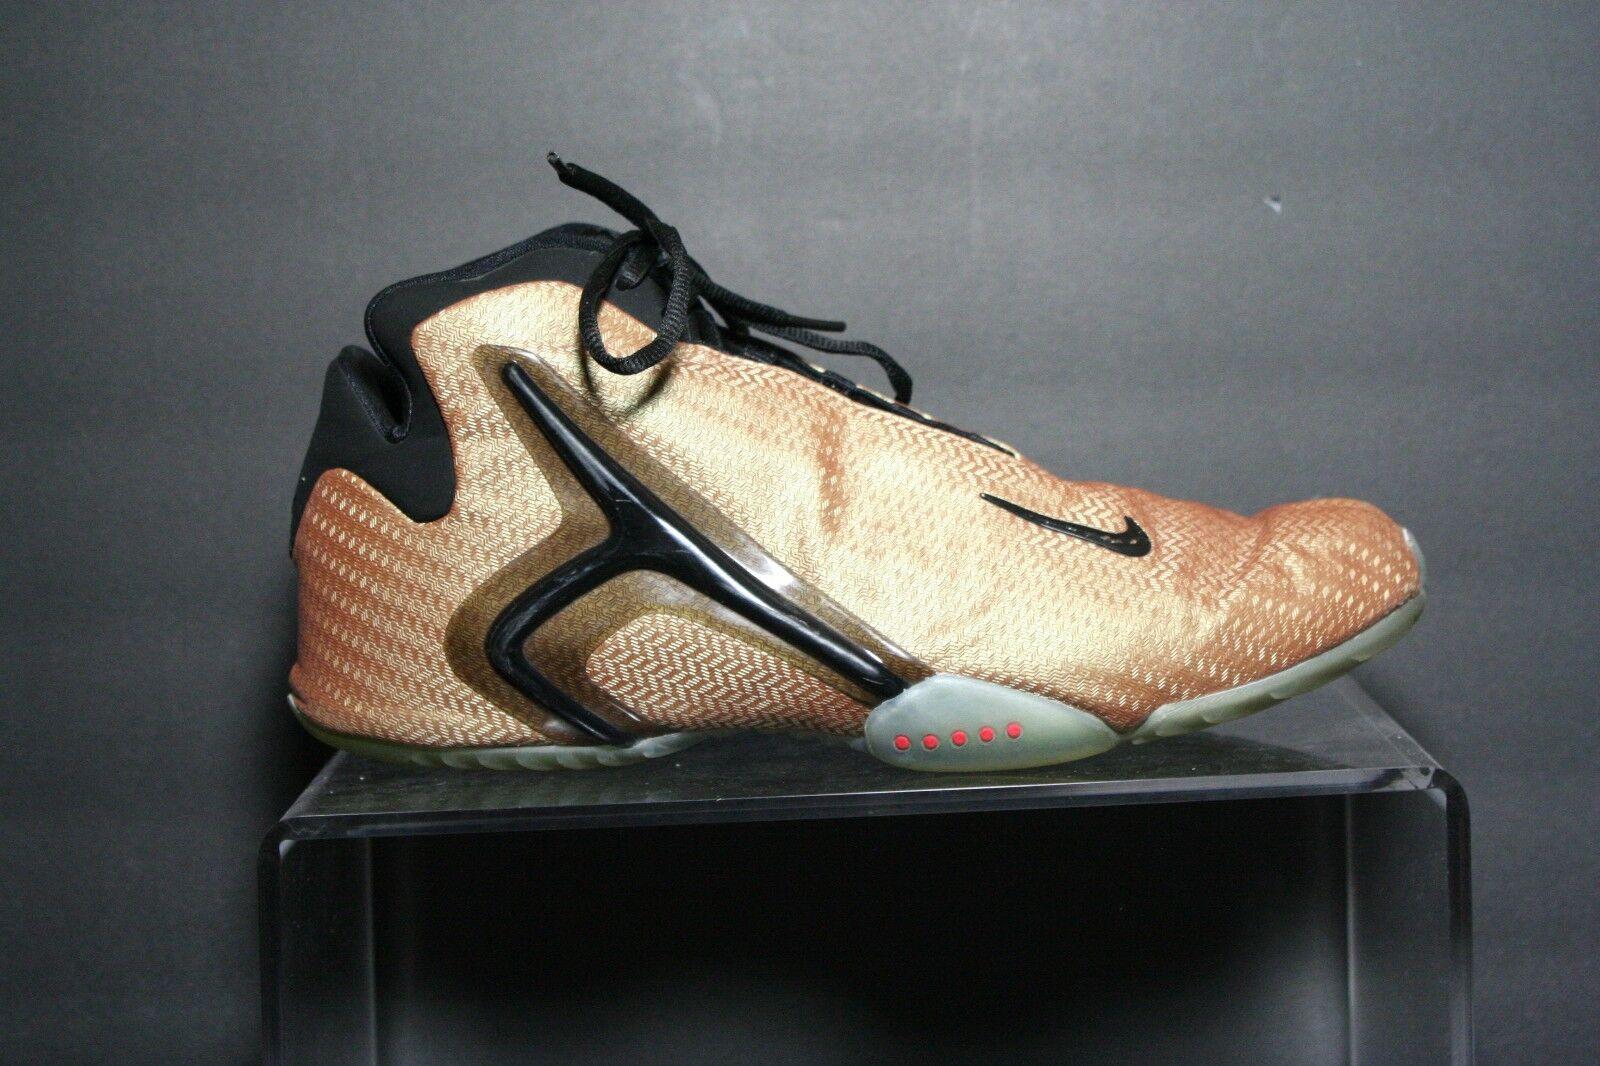 reputable site 2e79f 97c58 Nike Zoom Hyperflight Hyperflight Hyperflight Premium Lion Sneakers 13   Hipster Multi Men s 11.5 Coin 90e0f2